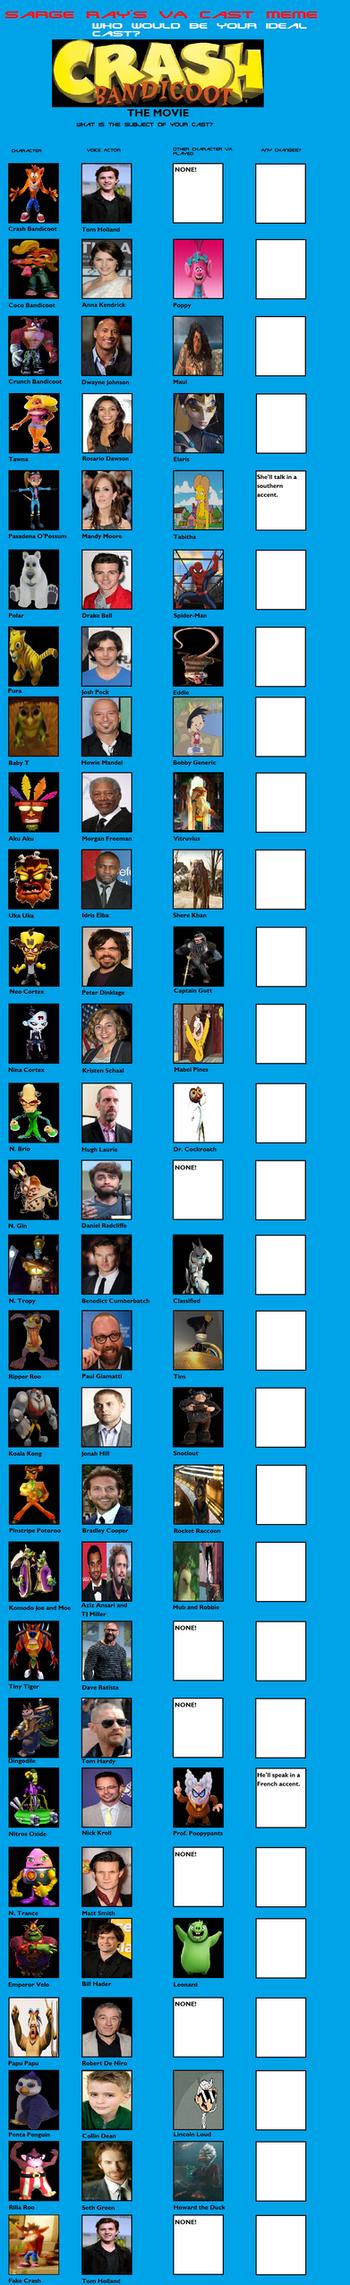 Crash Bandicoot The Movie Voice Cast by Prentis-65